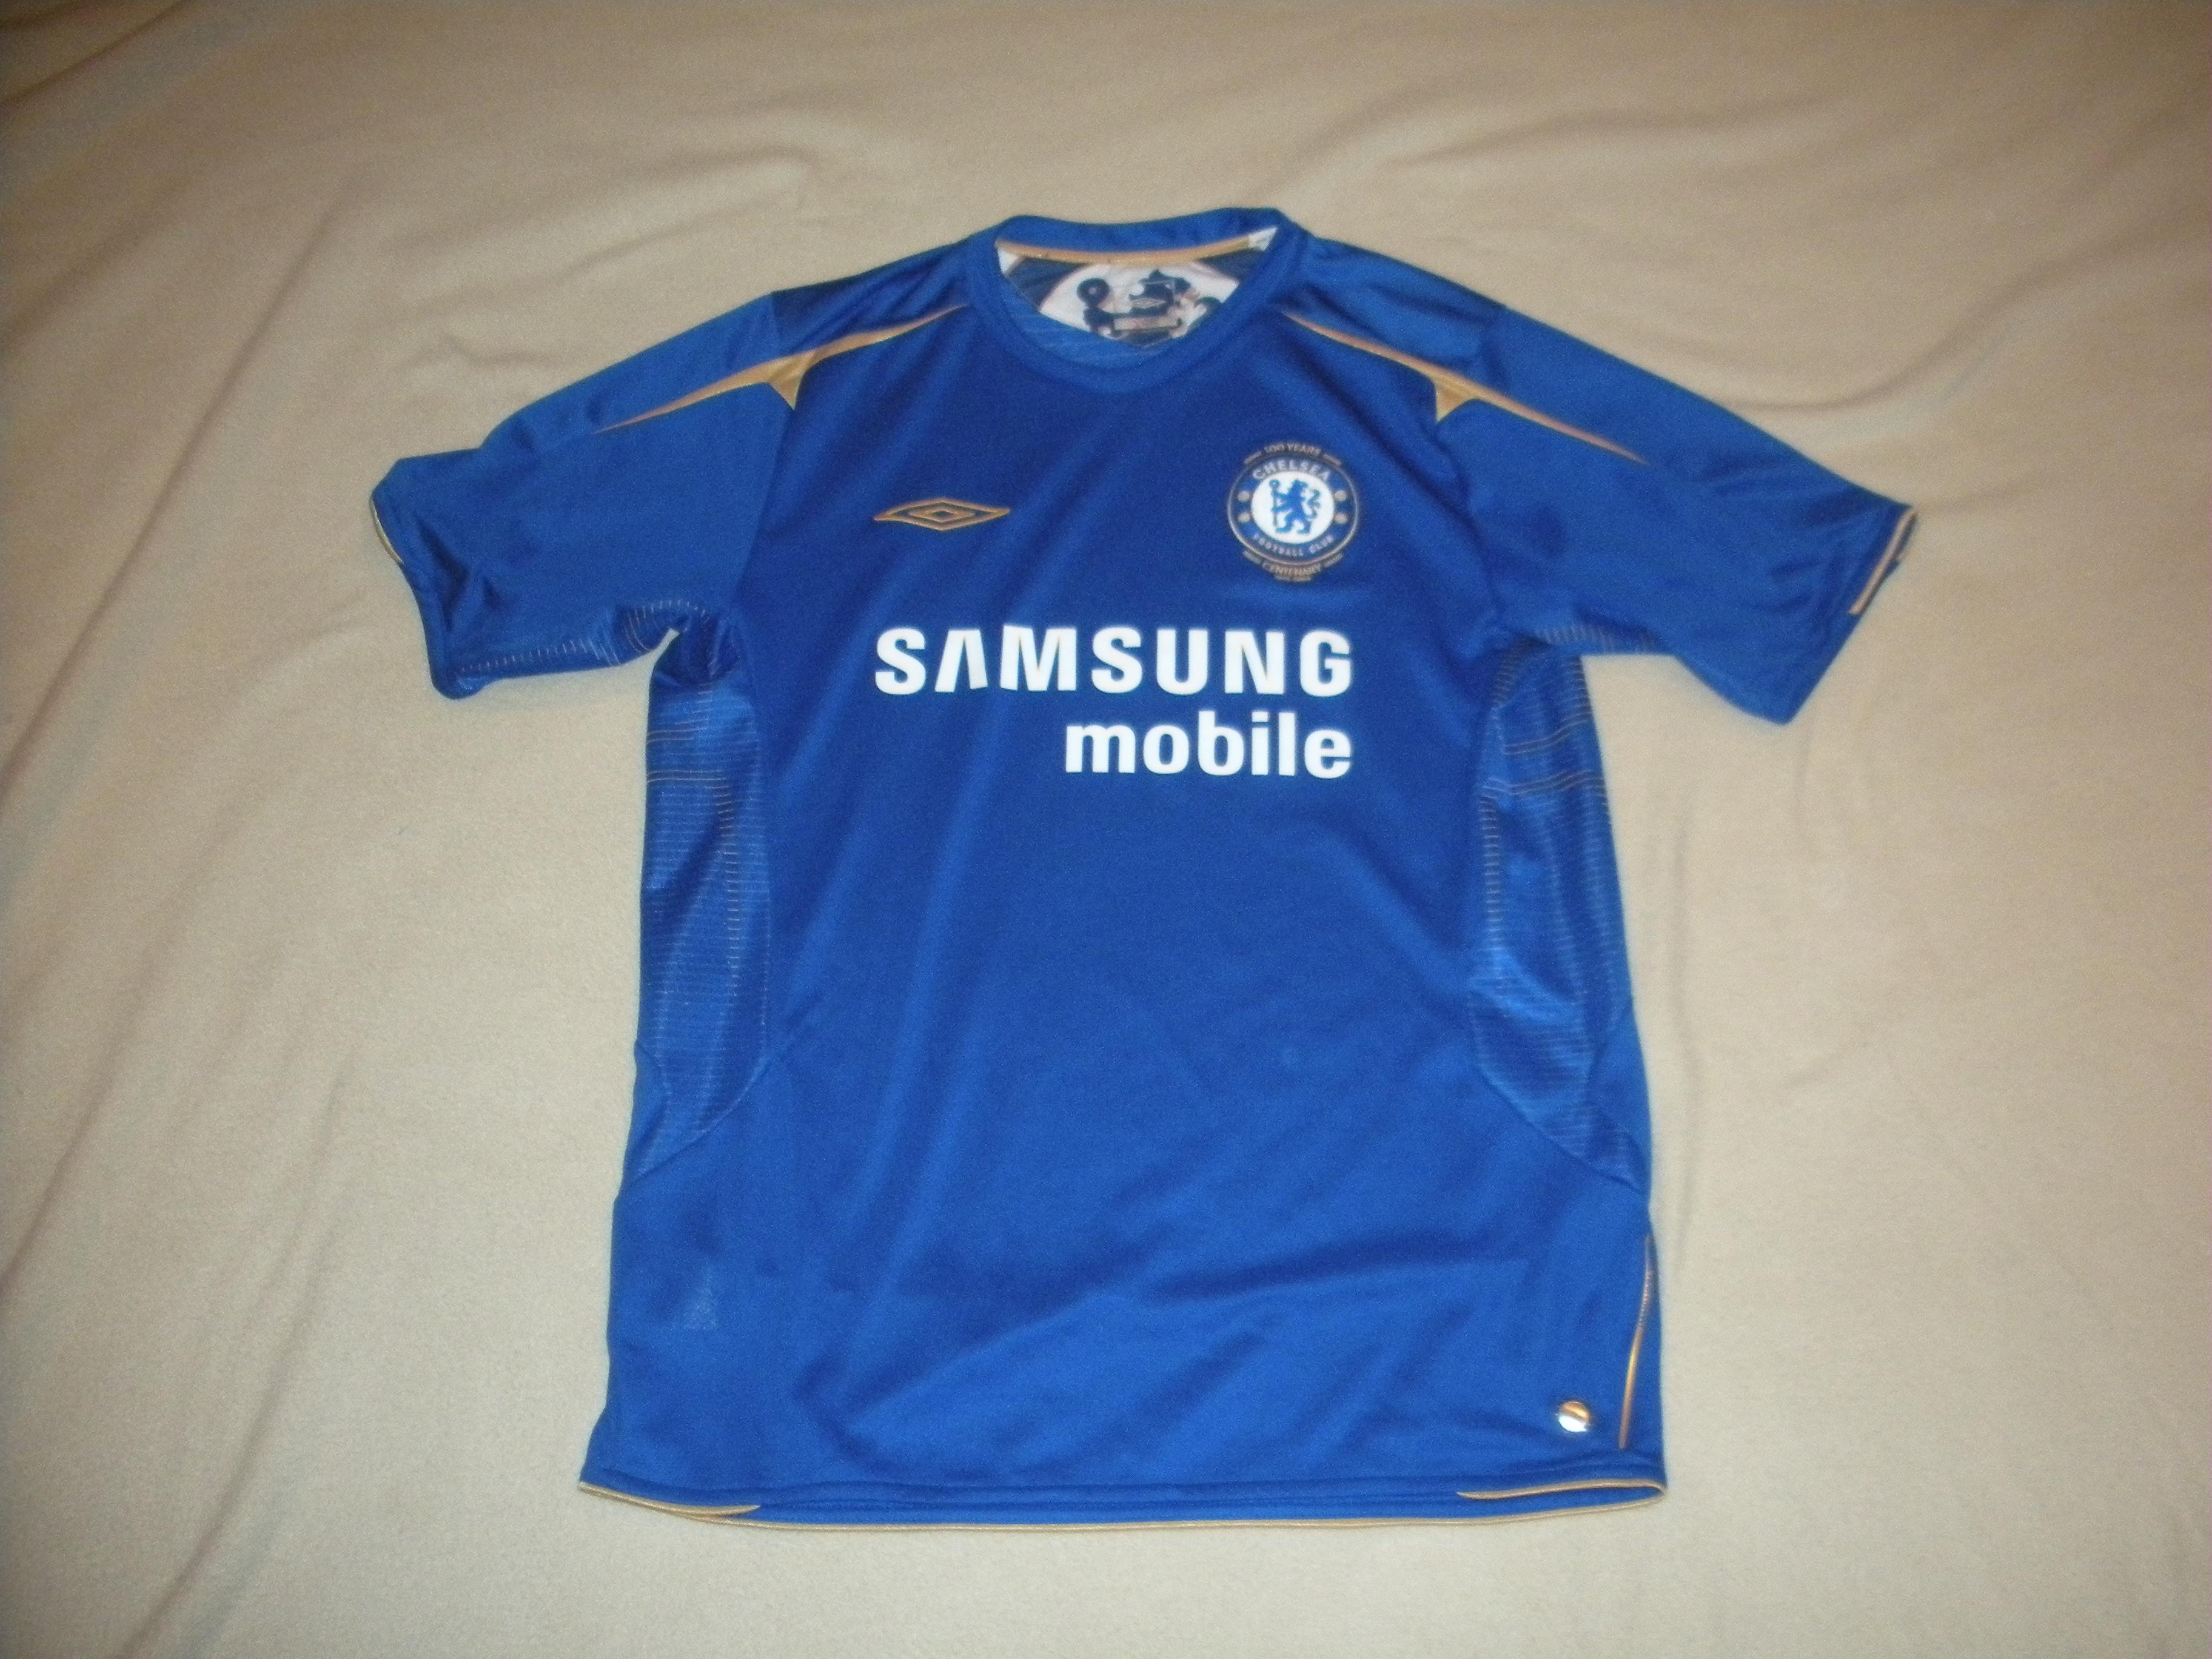 newest d5a52 1d26d Chelsea | Jay's Jersey Blog